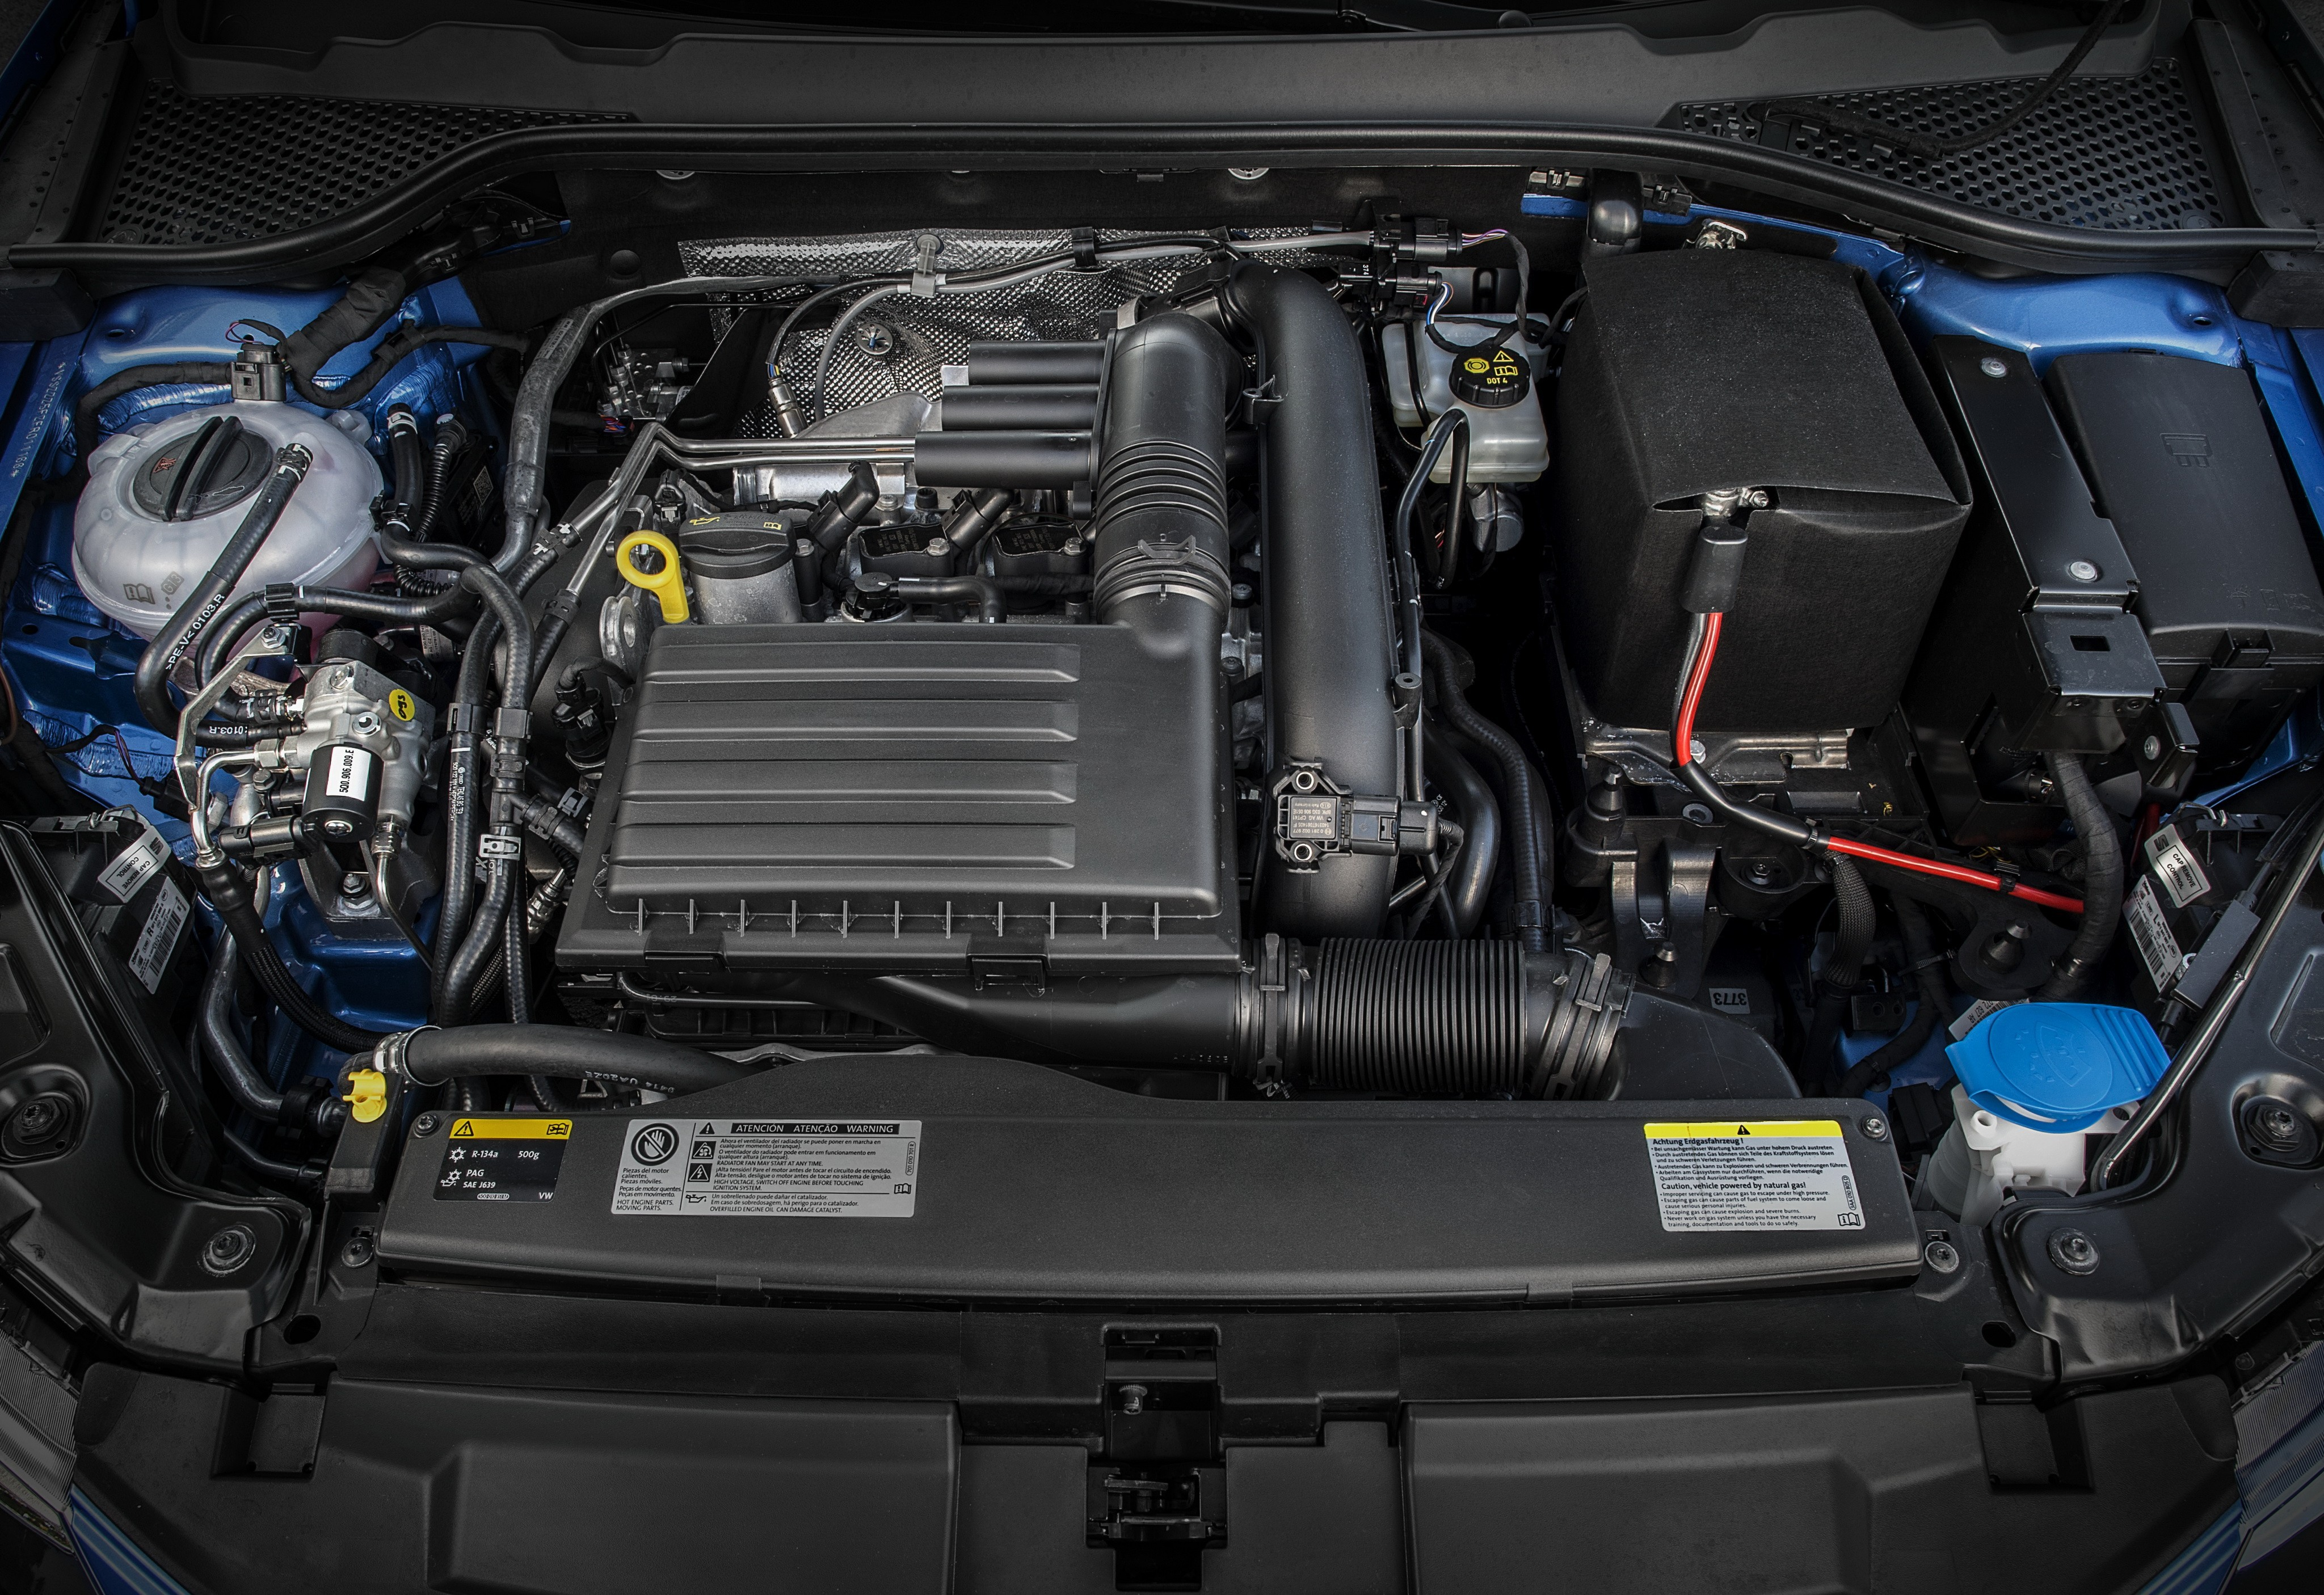 Volkswagen Unveils 1 0 TGI Turbo Engine That Runs on Natural Gas